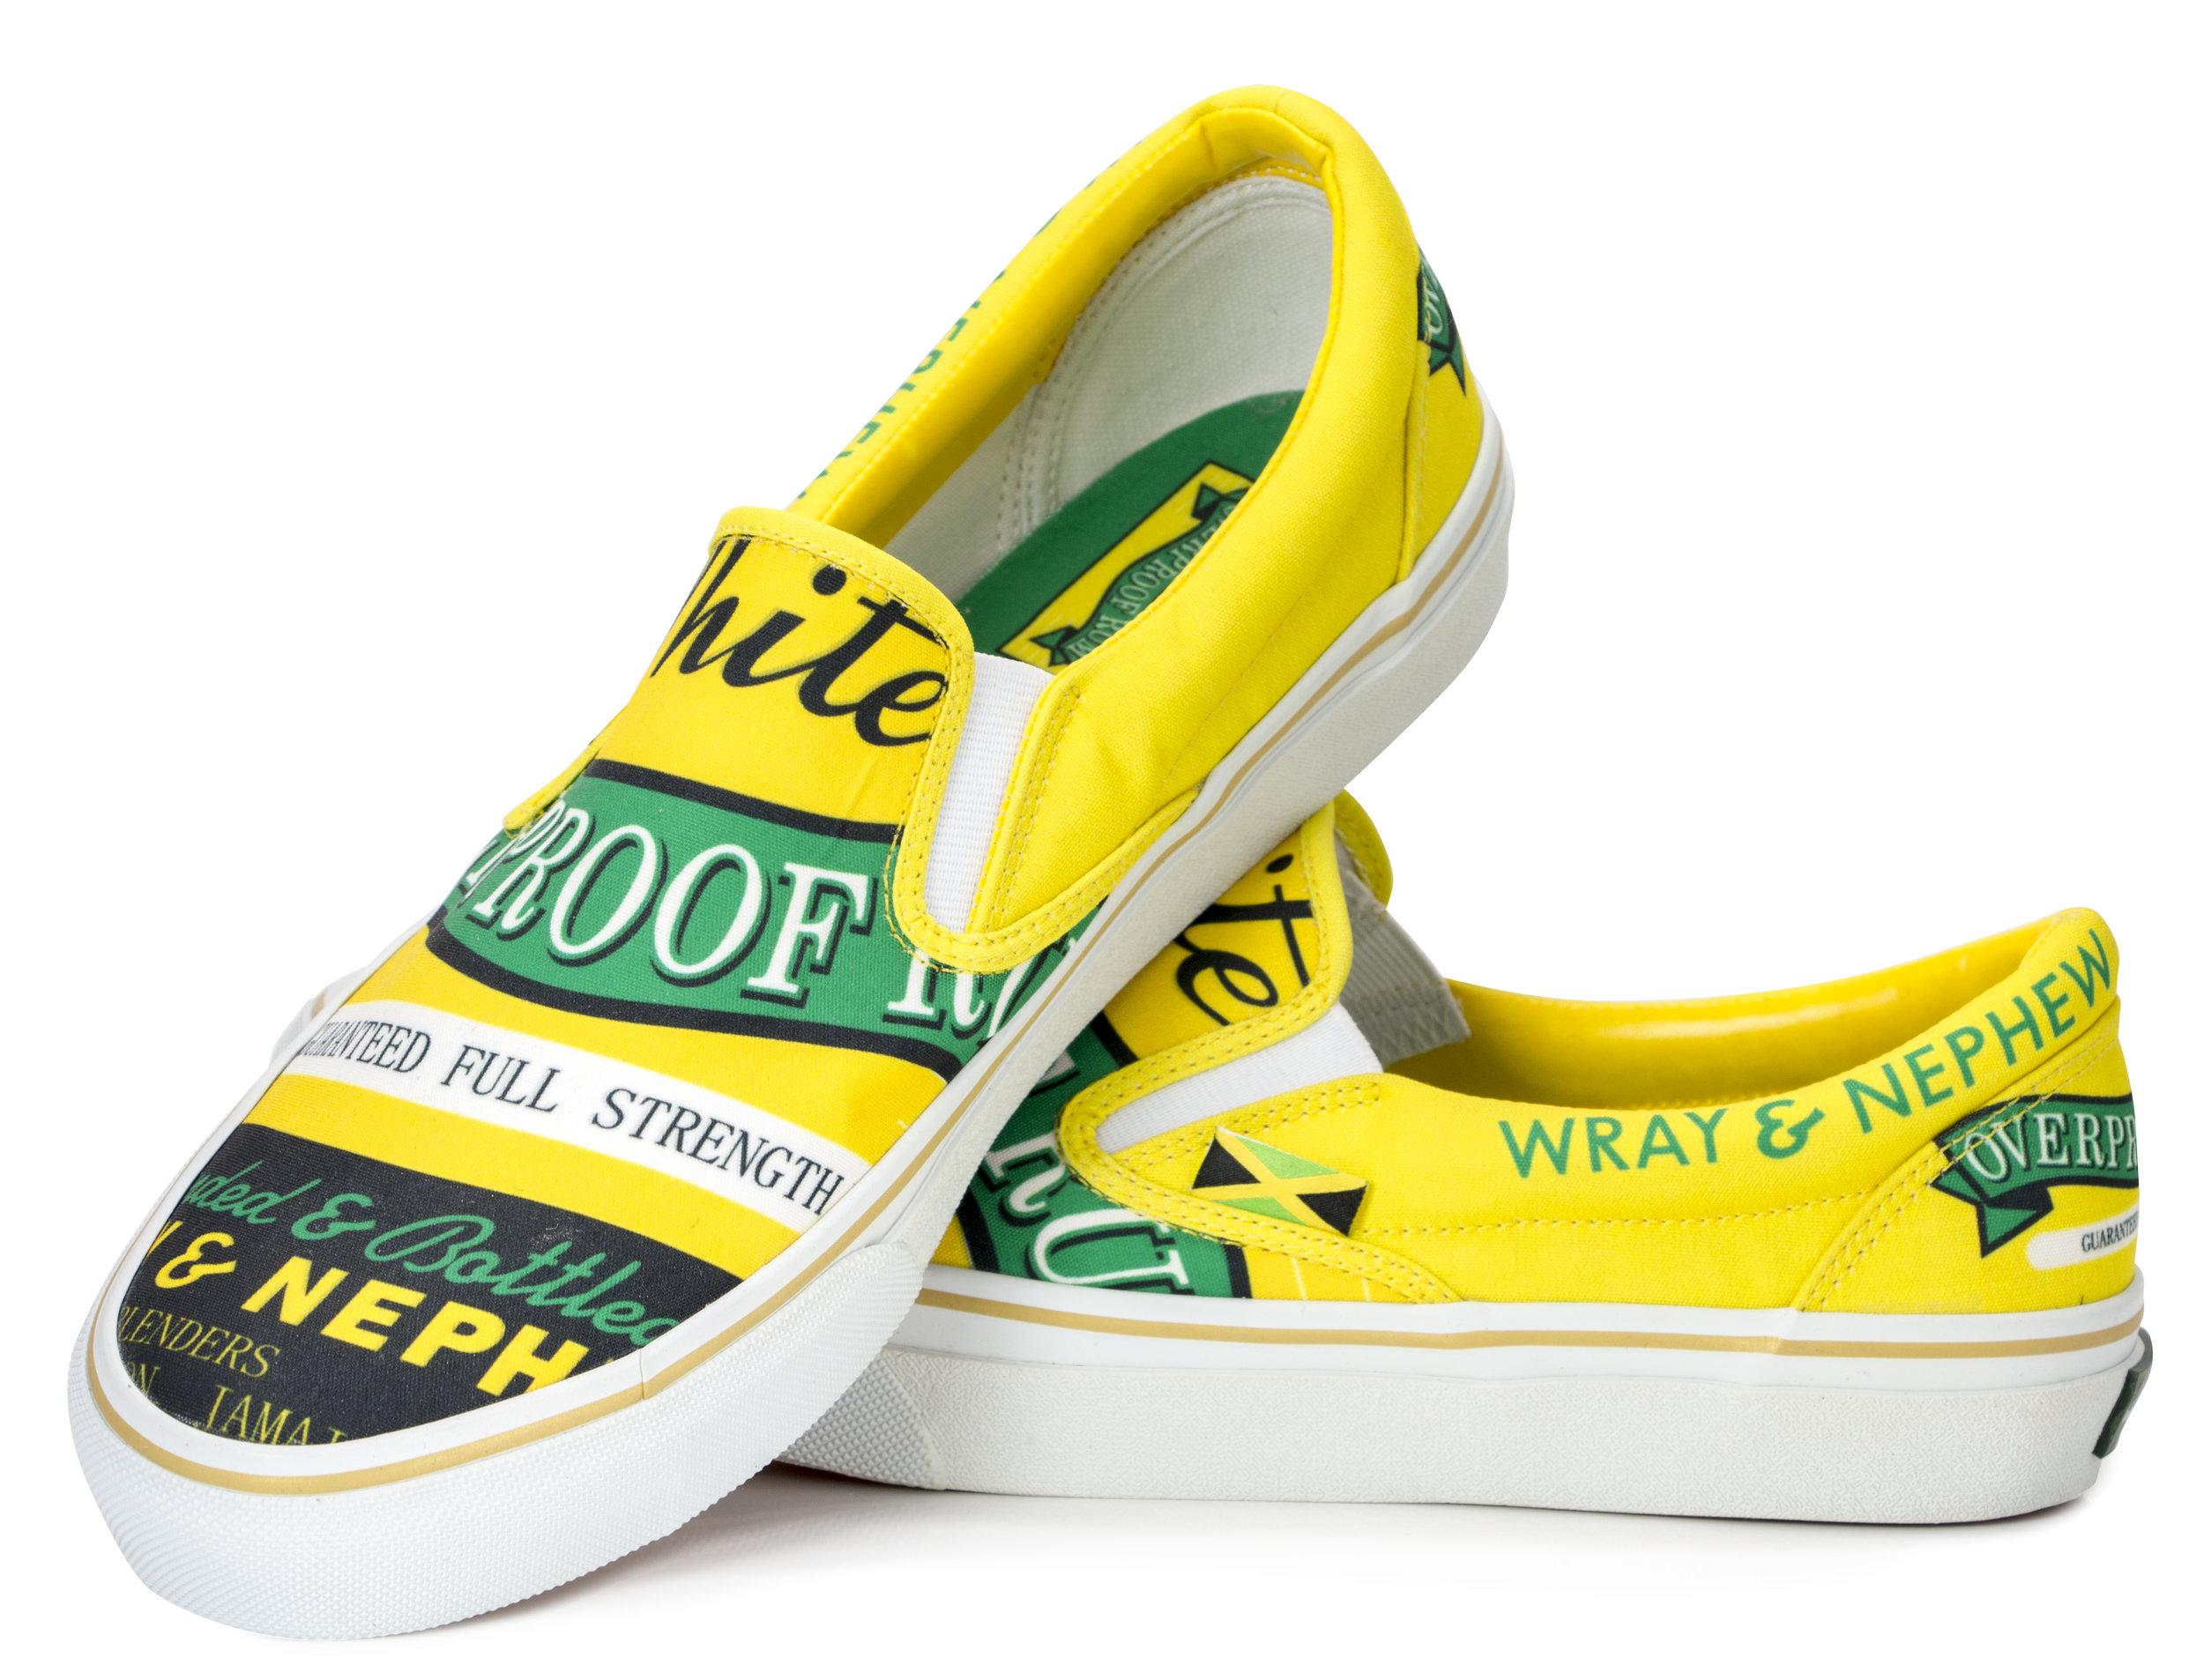 Wray and Newphew Slip-on Shoe.jpg